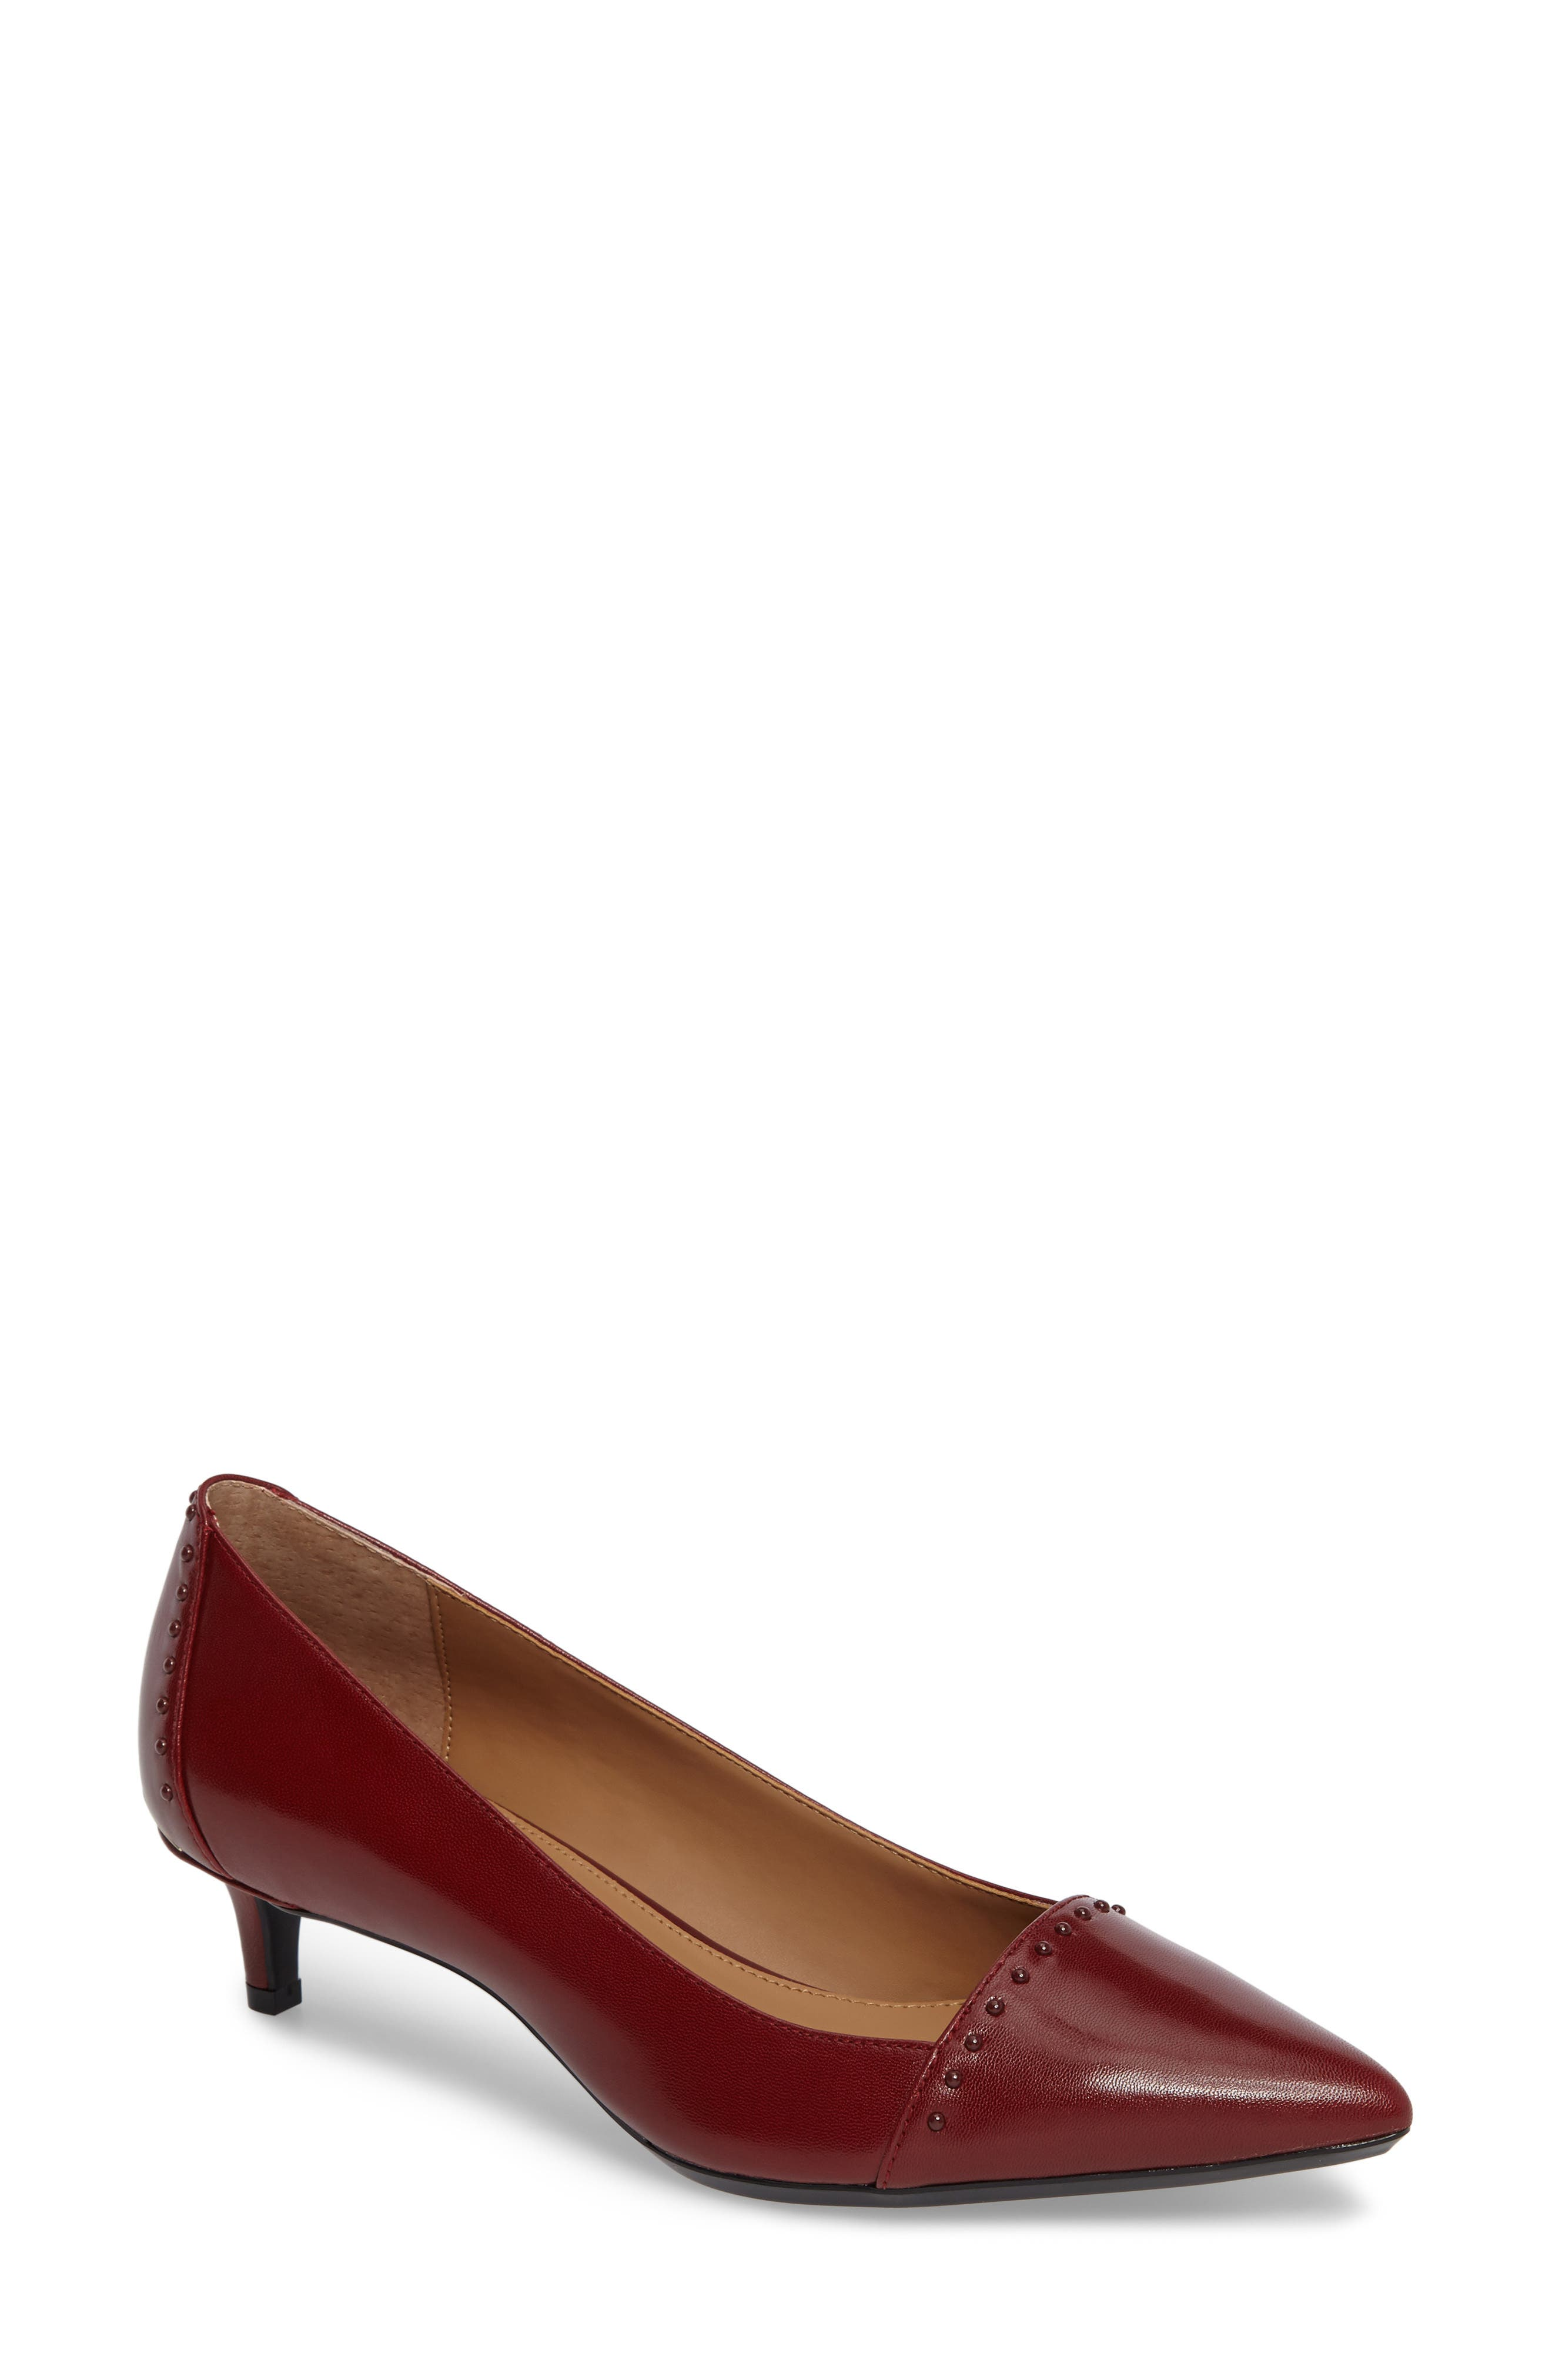 Griselda Studded Cap Toe Pump,                         Main,                         color, Cherry Red